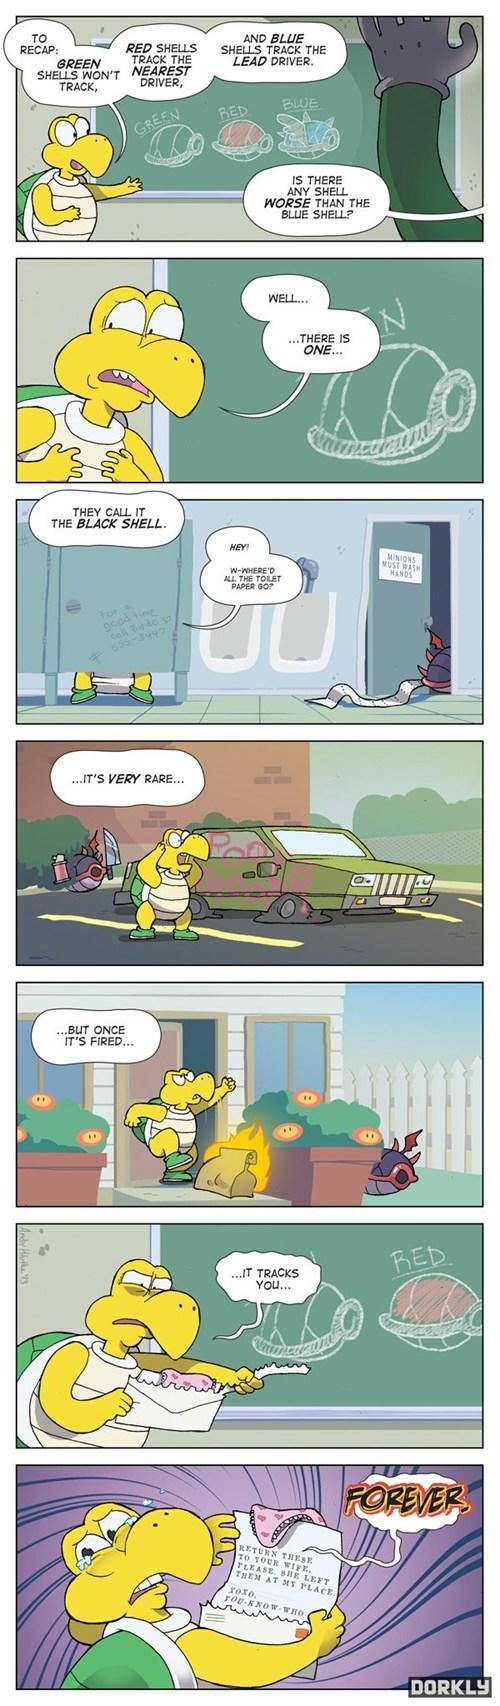 dorkly Mario Kart comics - 7538285568